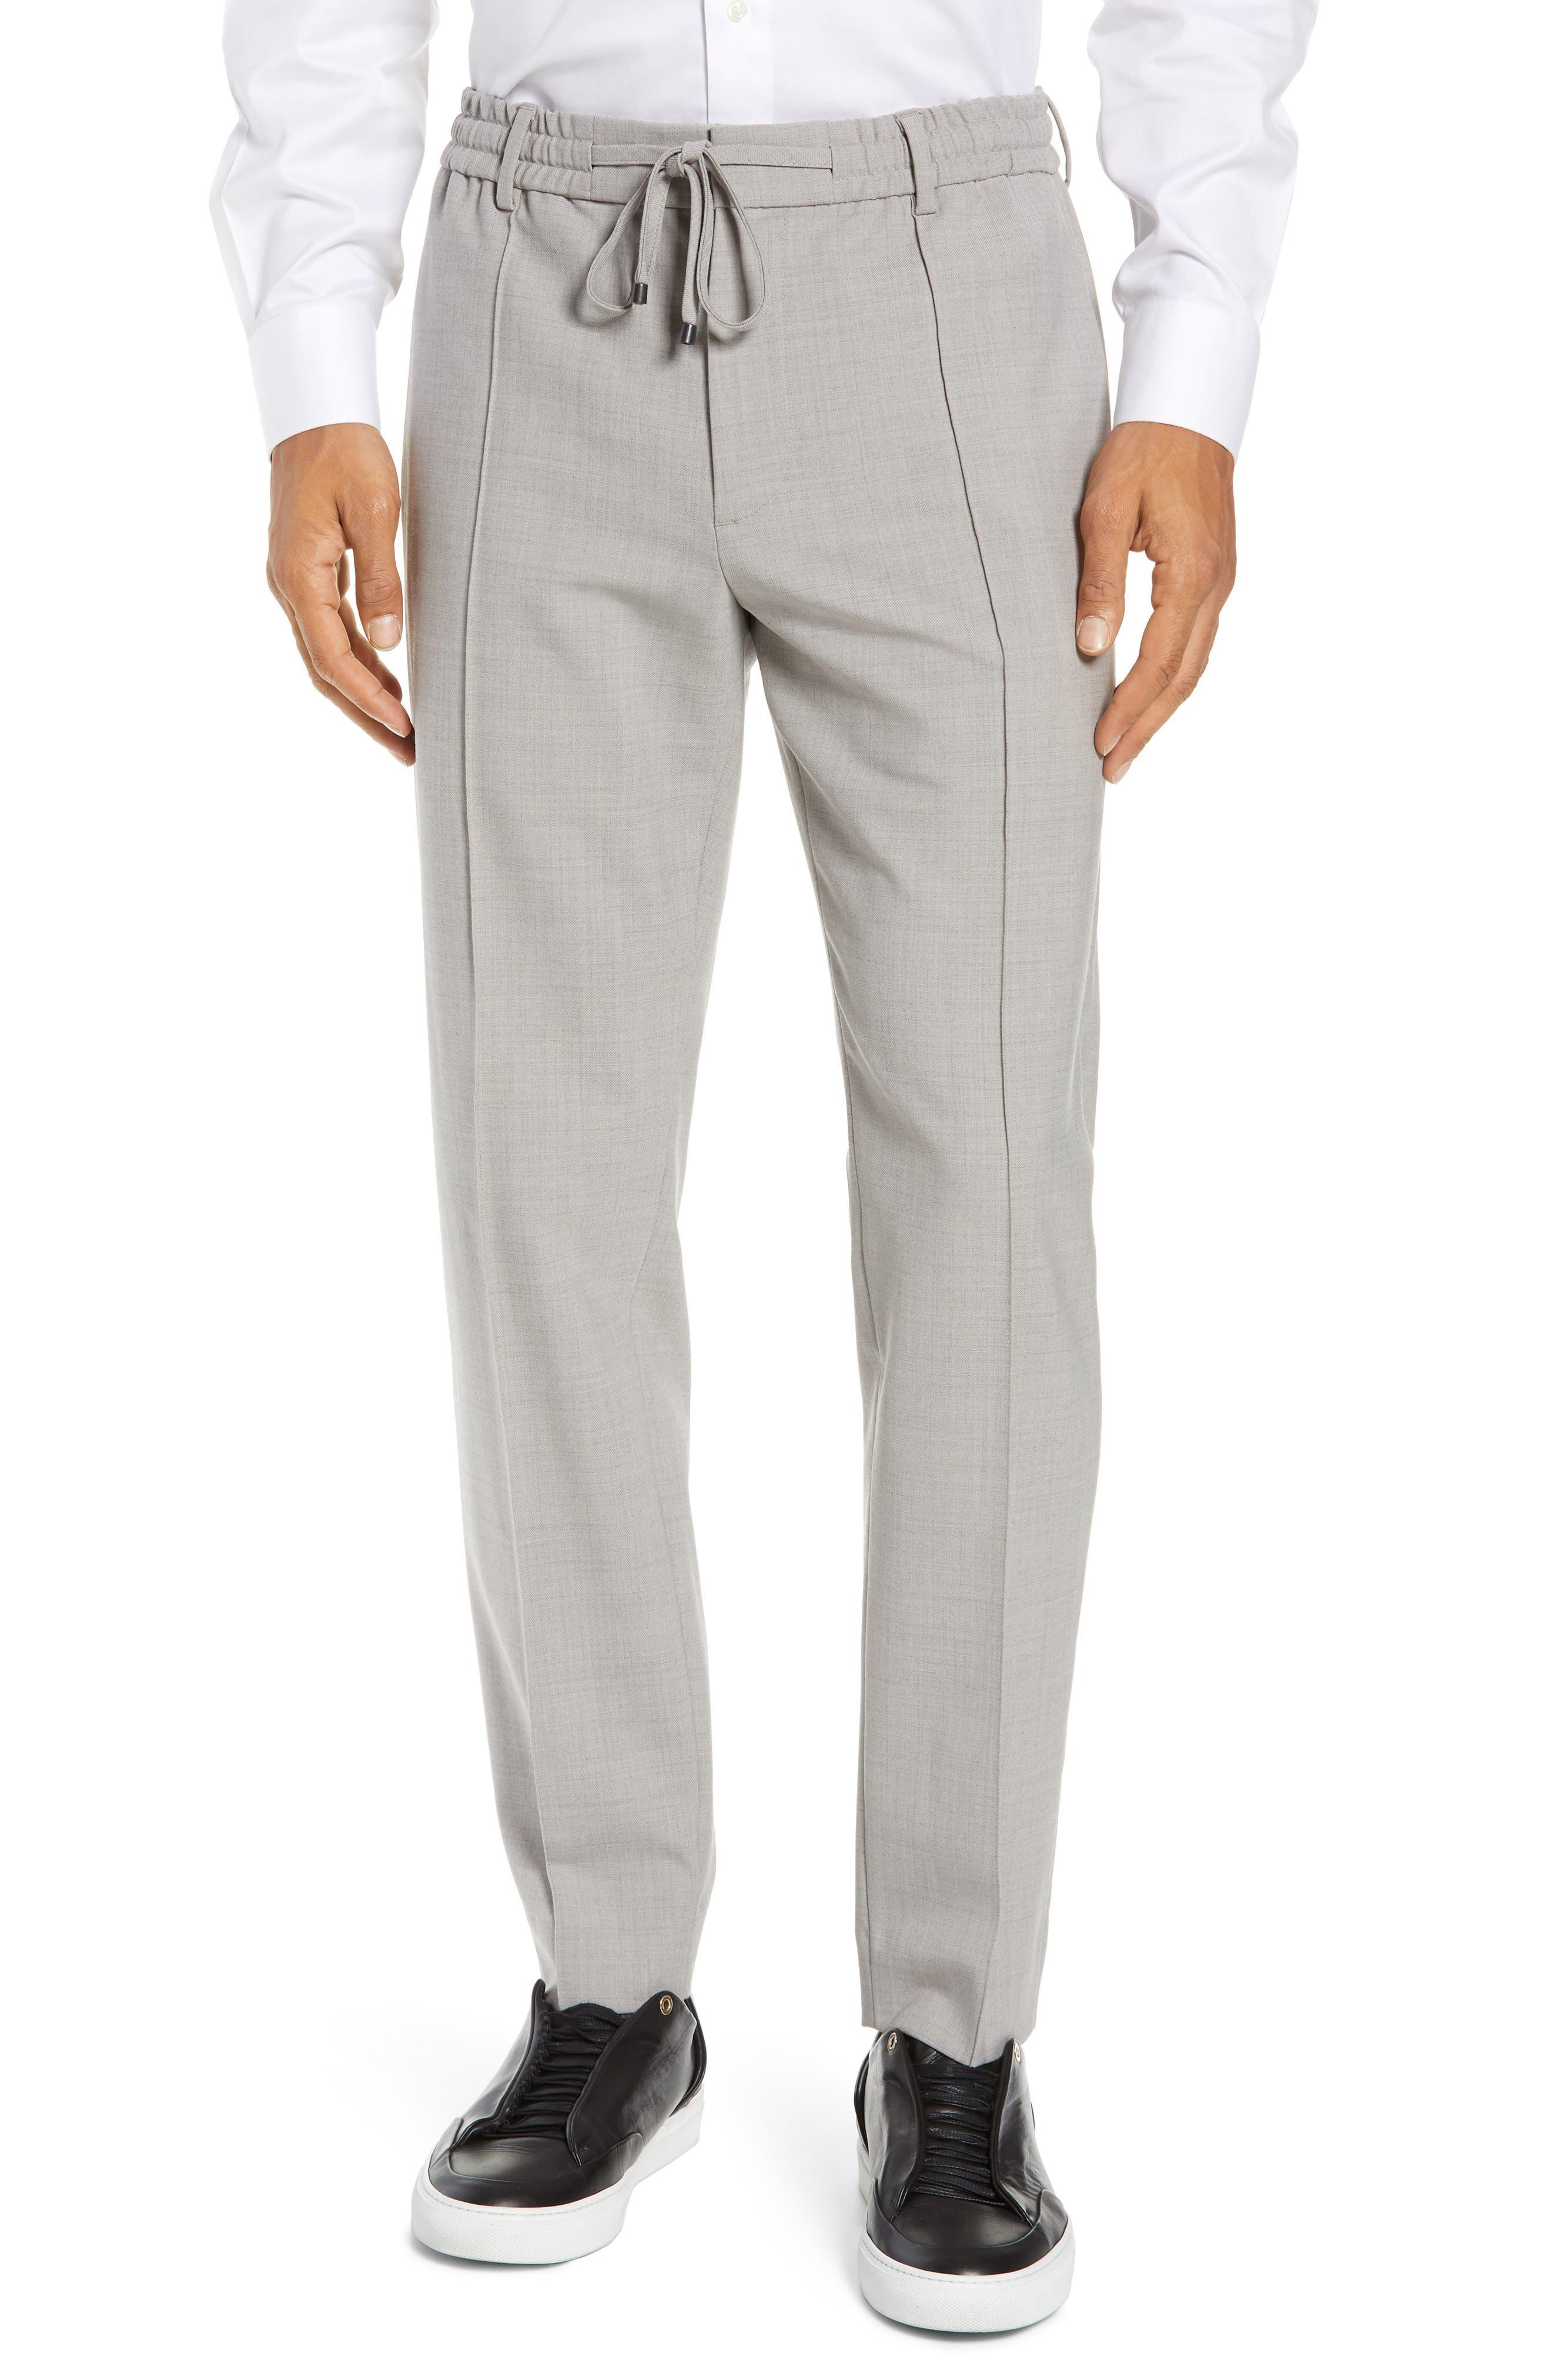 CLUB MONACO Trim Fit Pintuck Pants, Main, color, HEATHER GREY